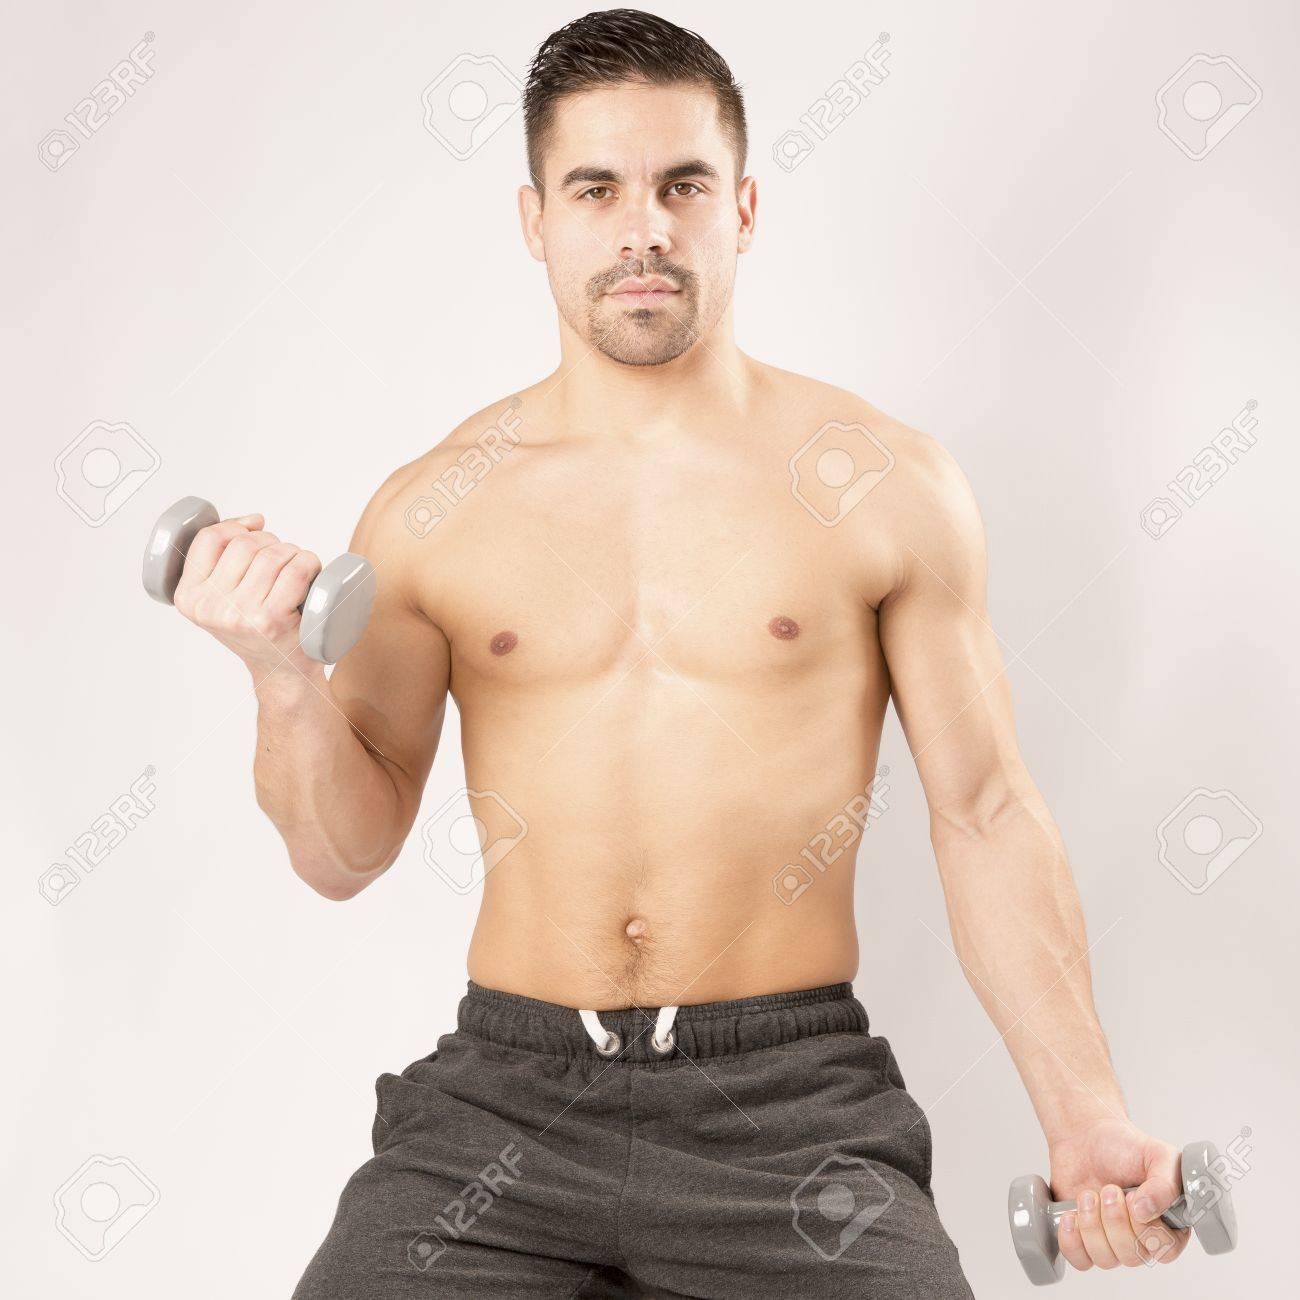 Gay model pic